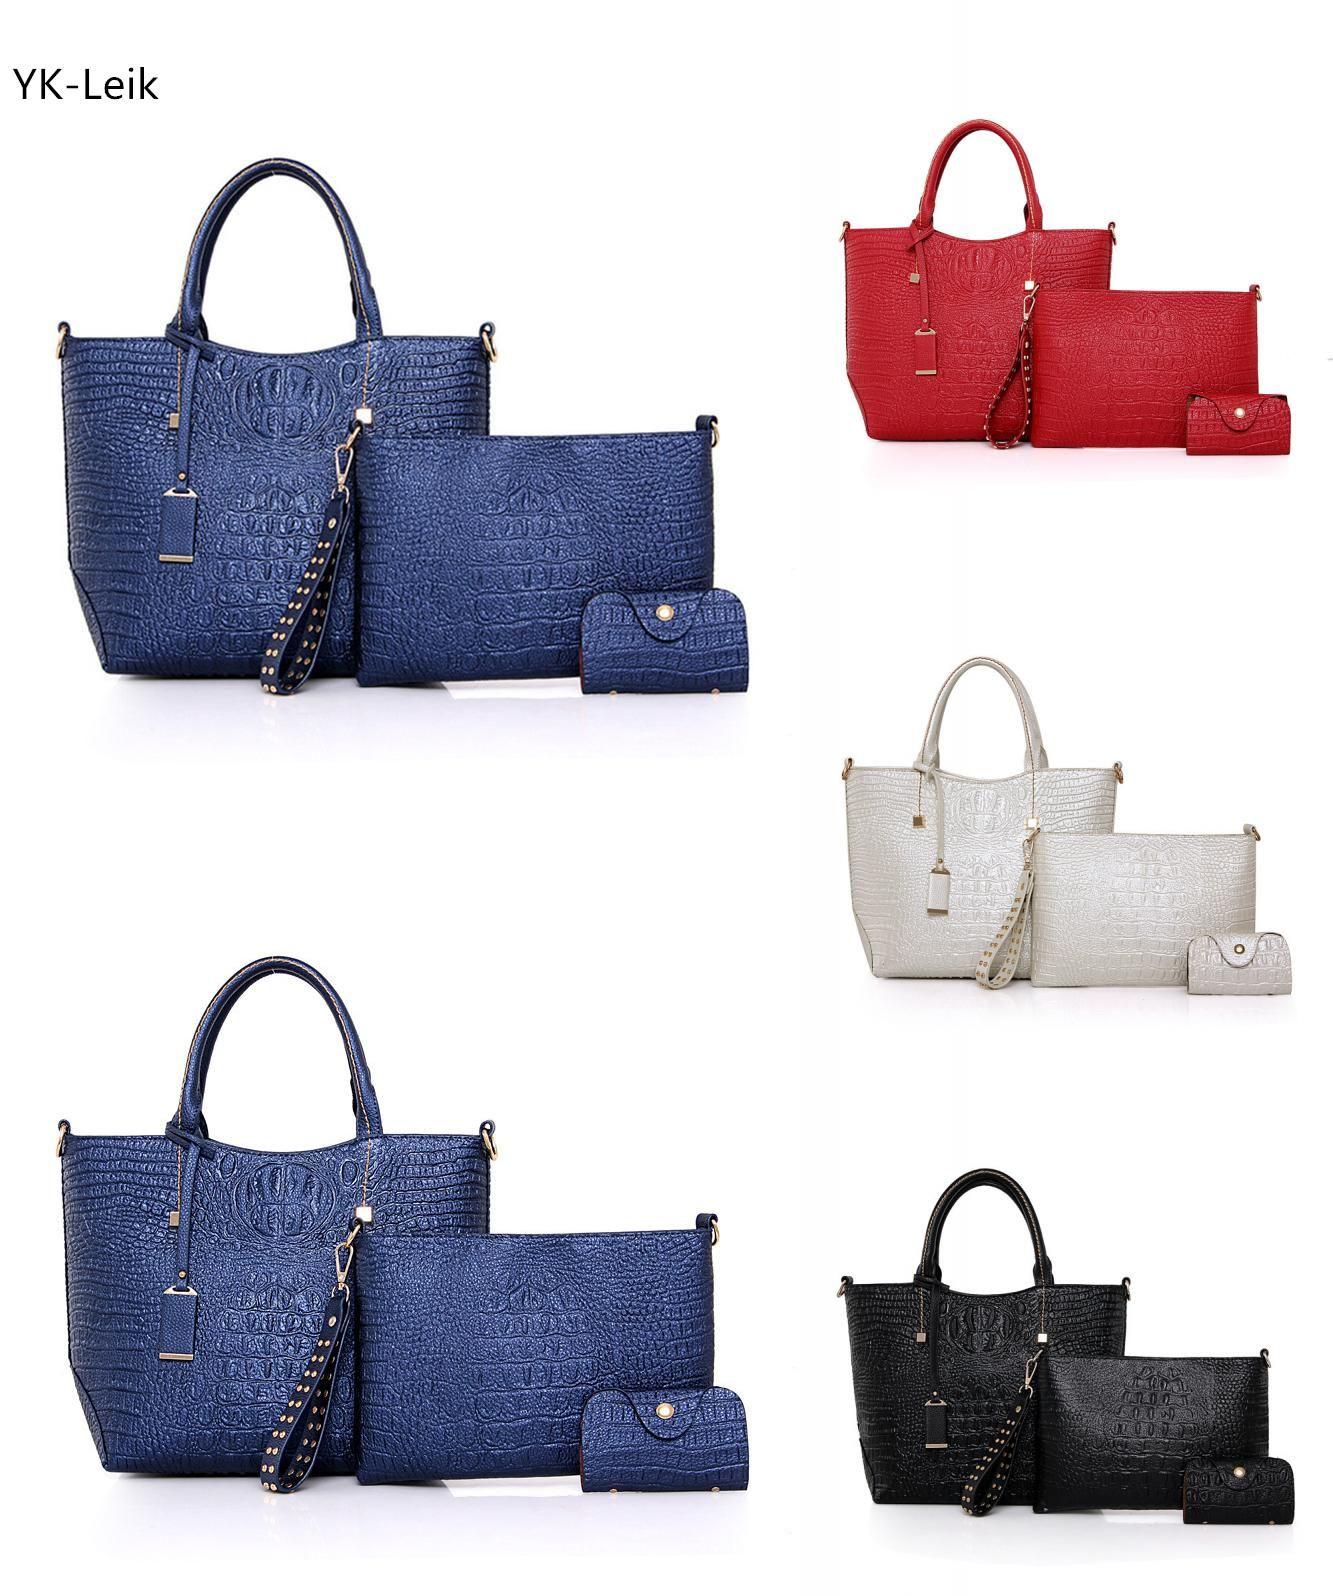 1a1025df4b  Visit to Buy  YK-Leik 2017 Luxury Women leather Handbags Women Bags  Designer